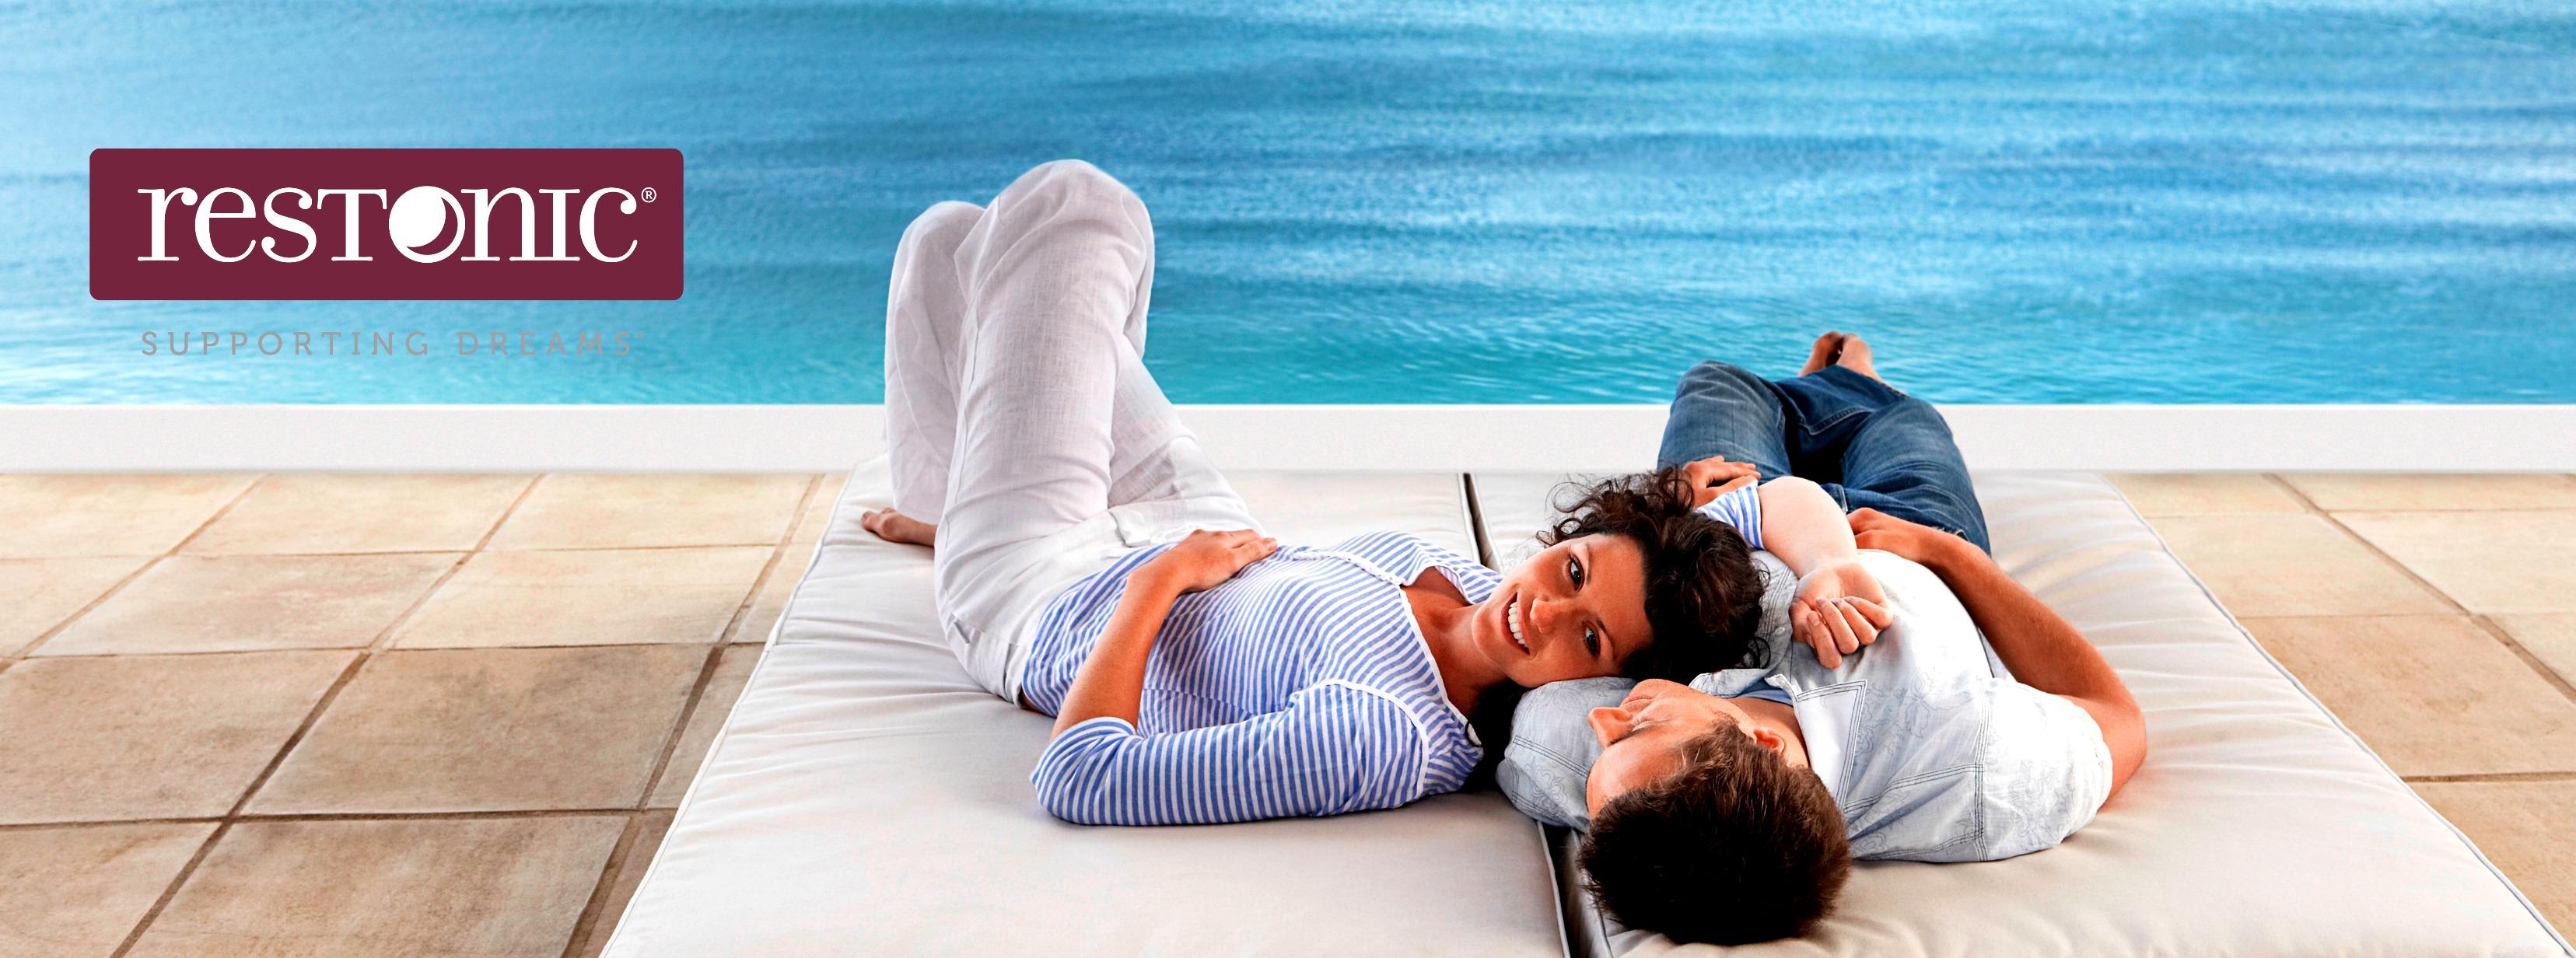 reviews mattress com picture goodbed mattresses restonic serta